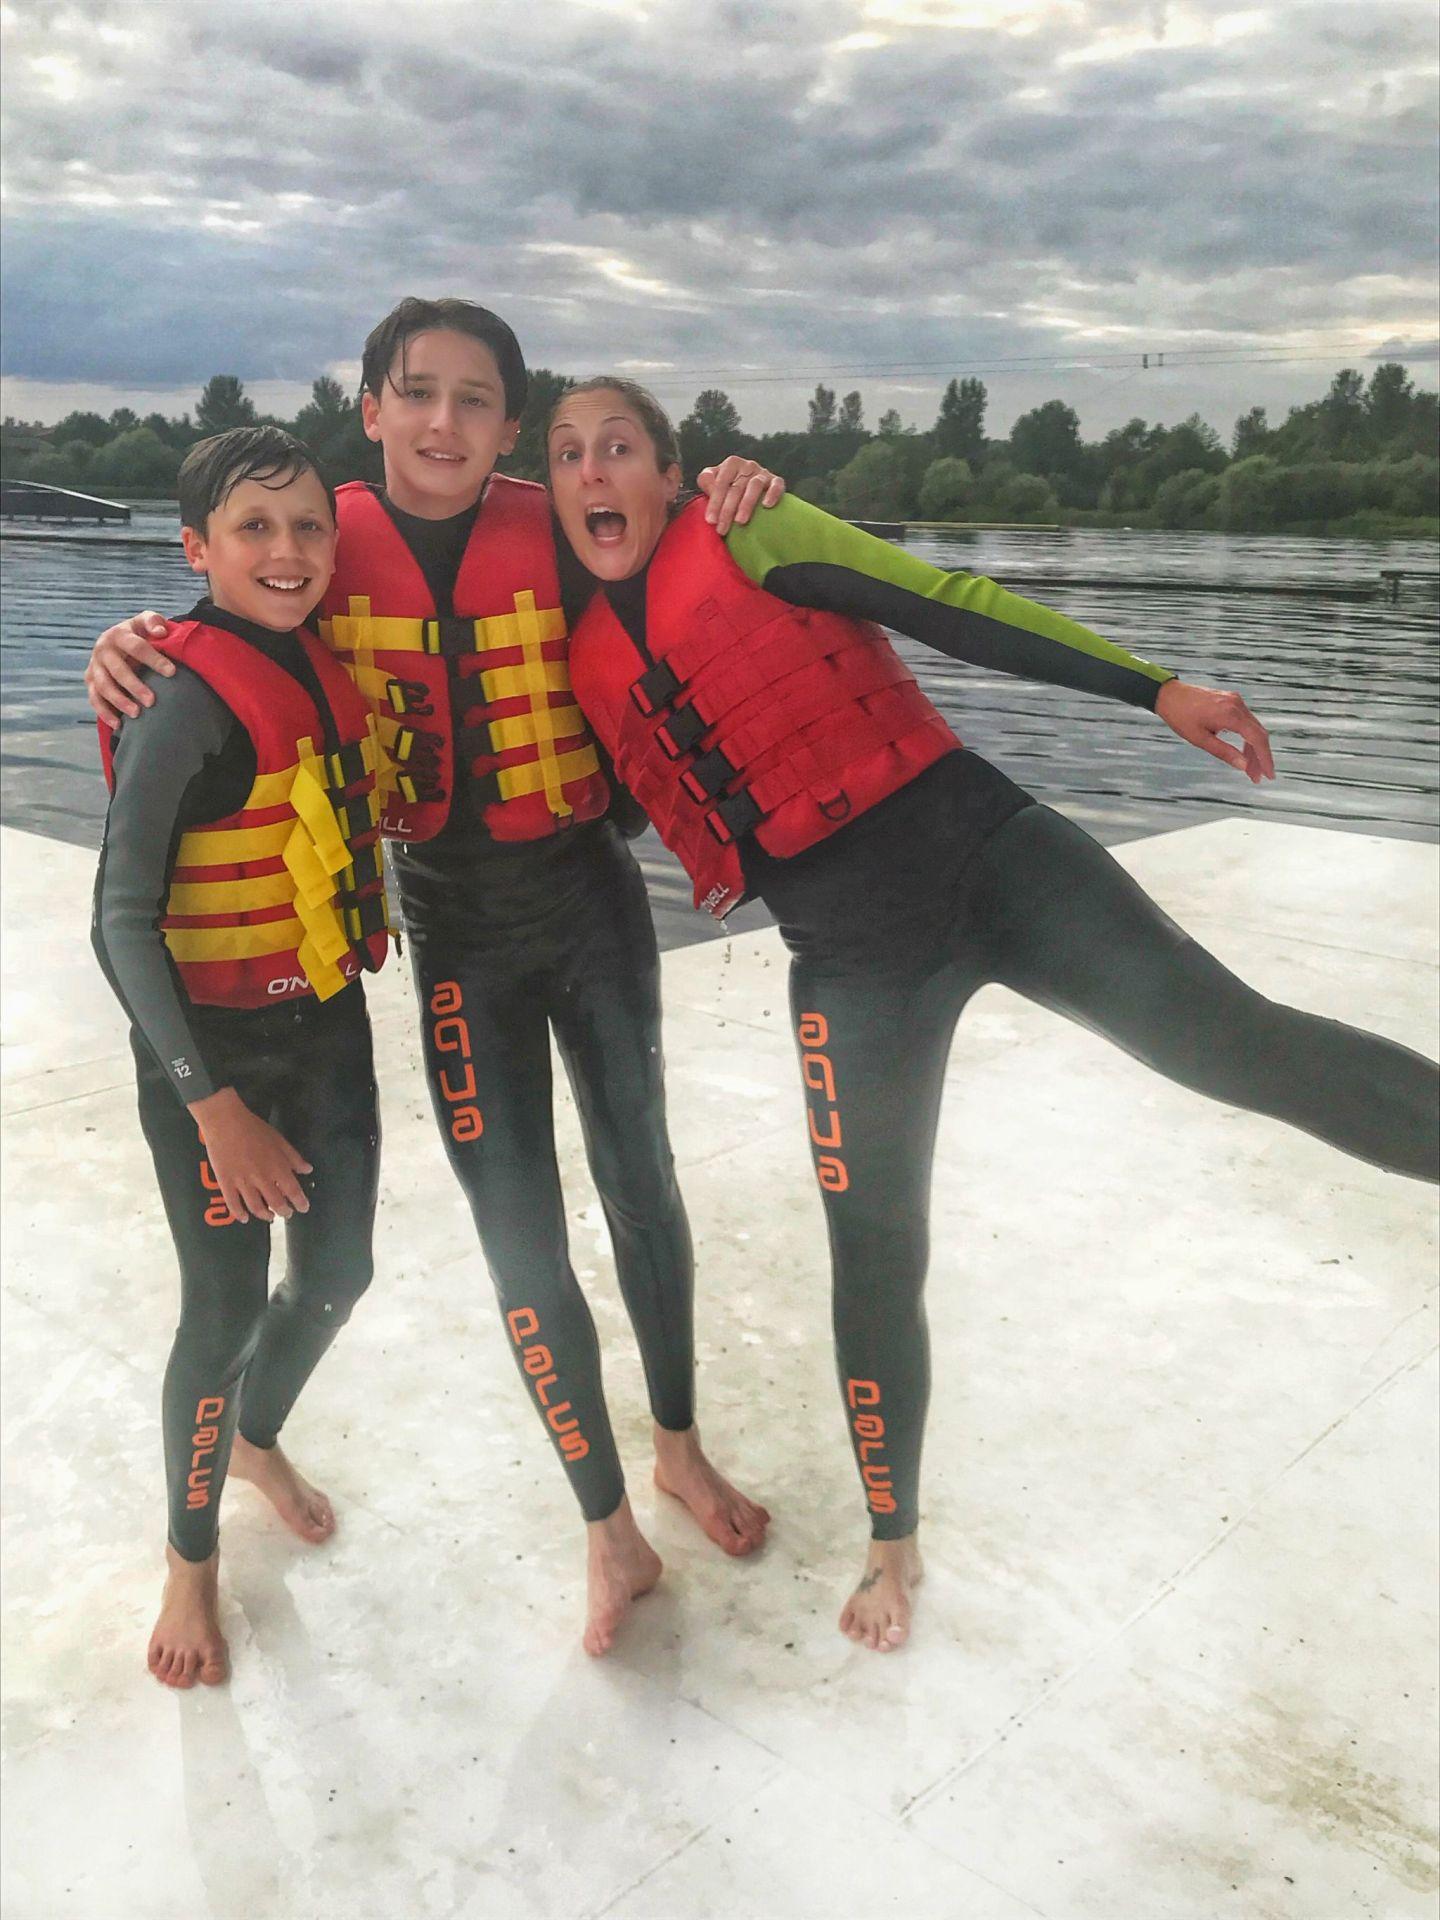 family fun Aqua Parcs Willen Lake Milton Keynes